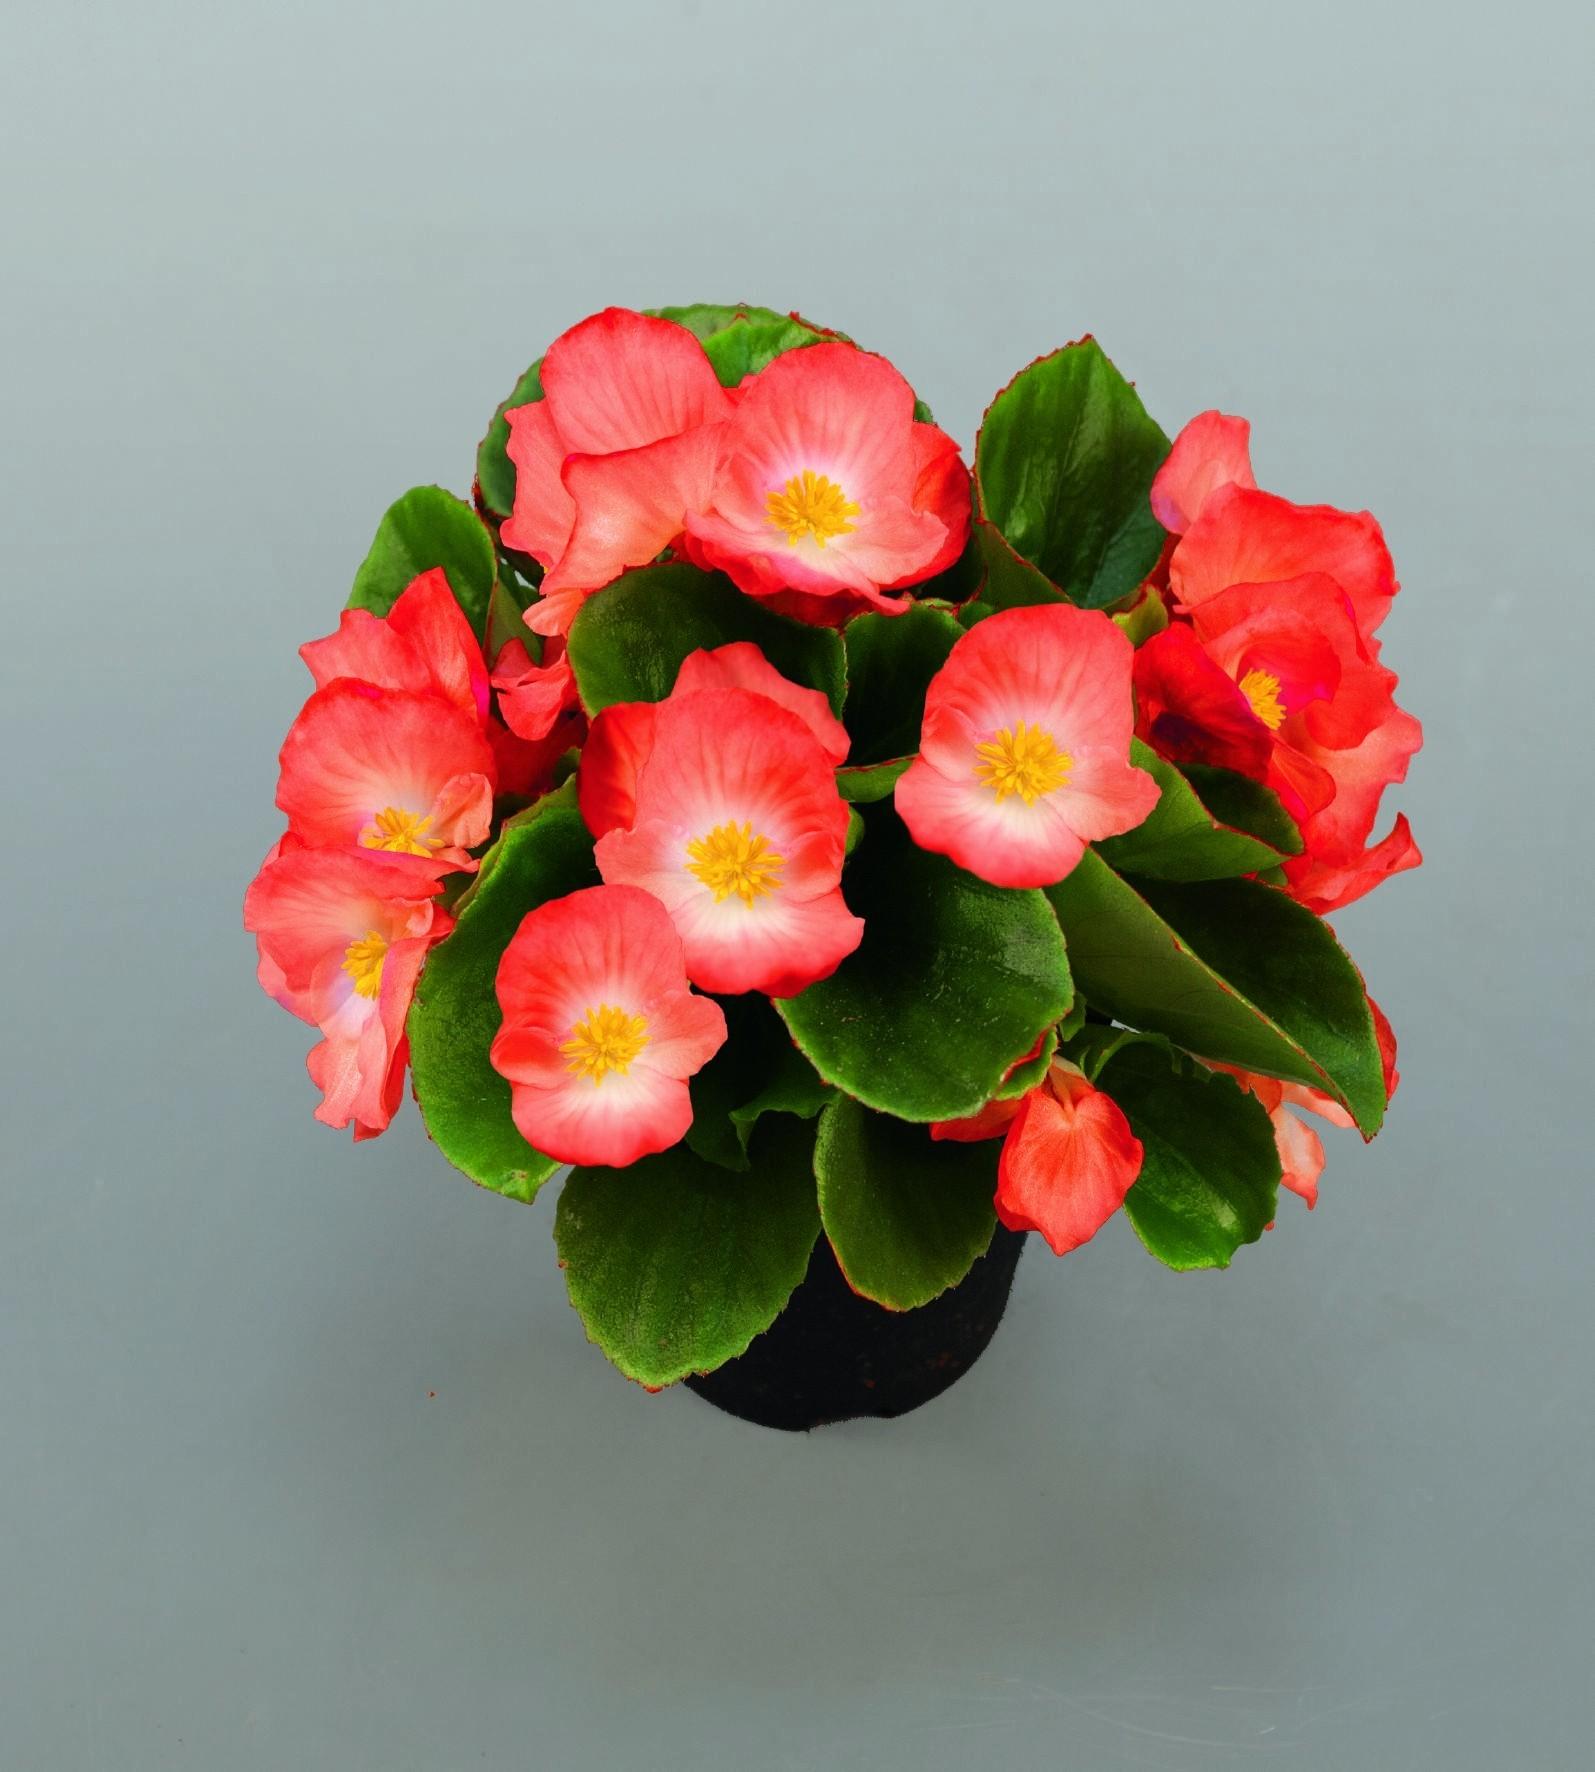 Seminte Begonia semperflorens Sprint Plus F1 Lipstick drajerate